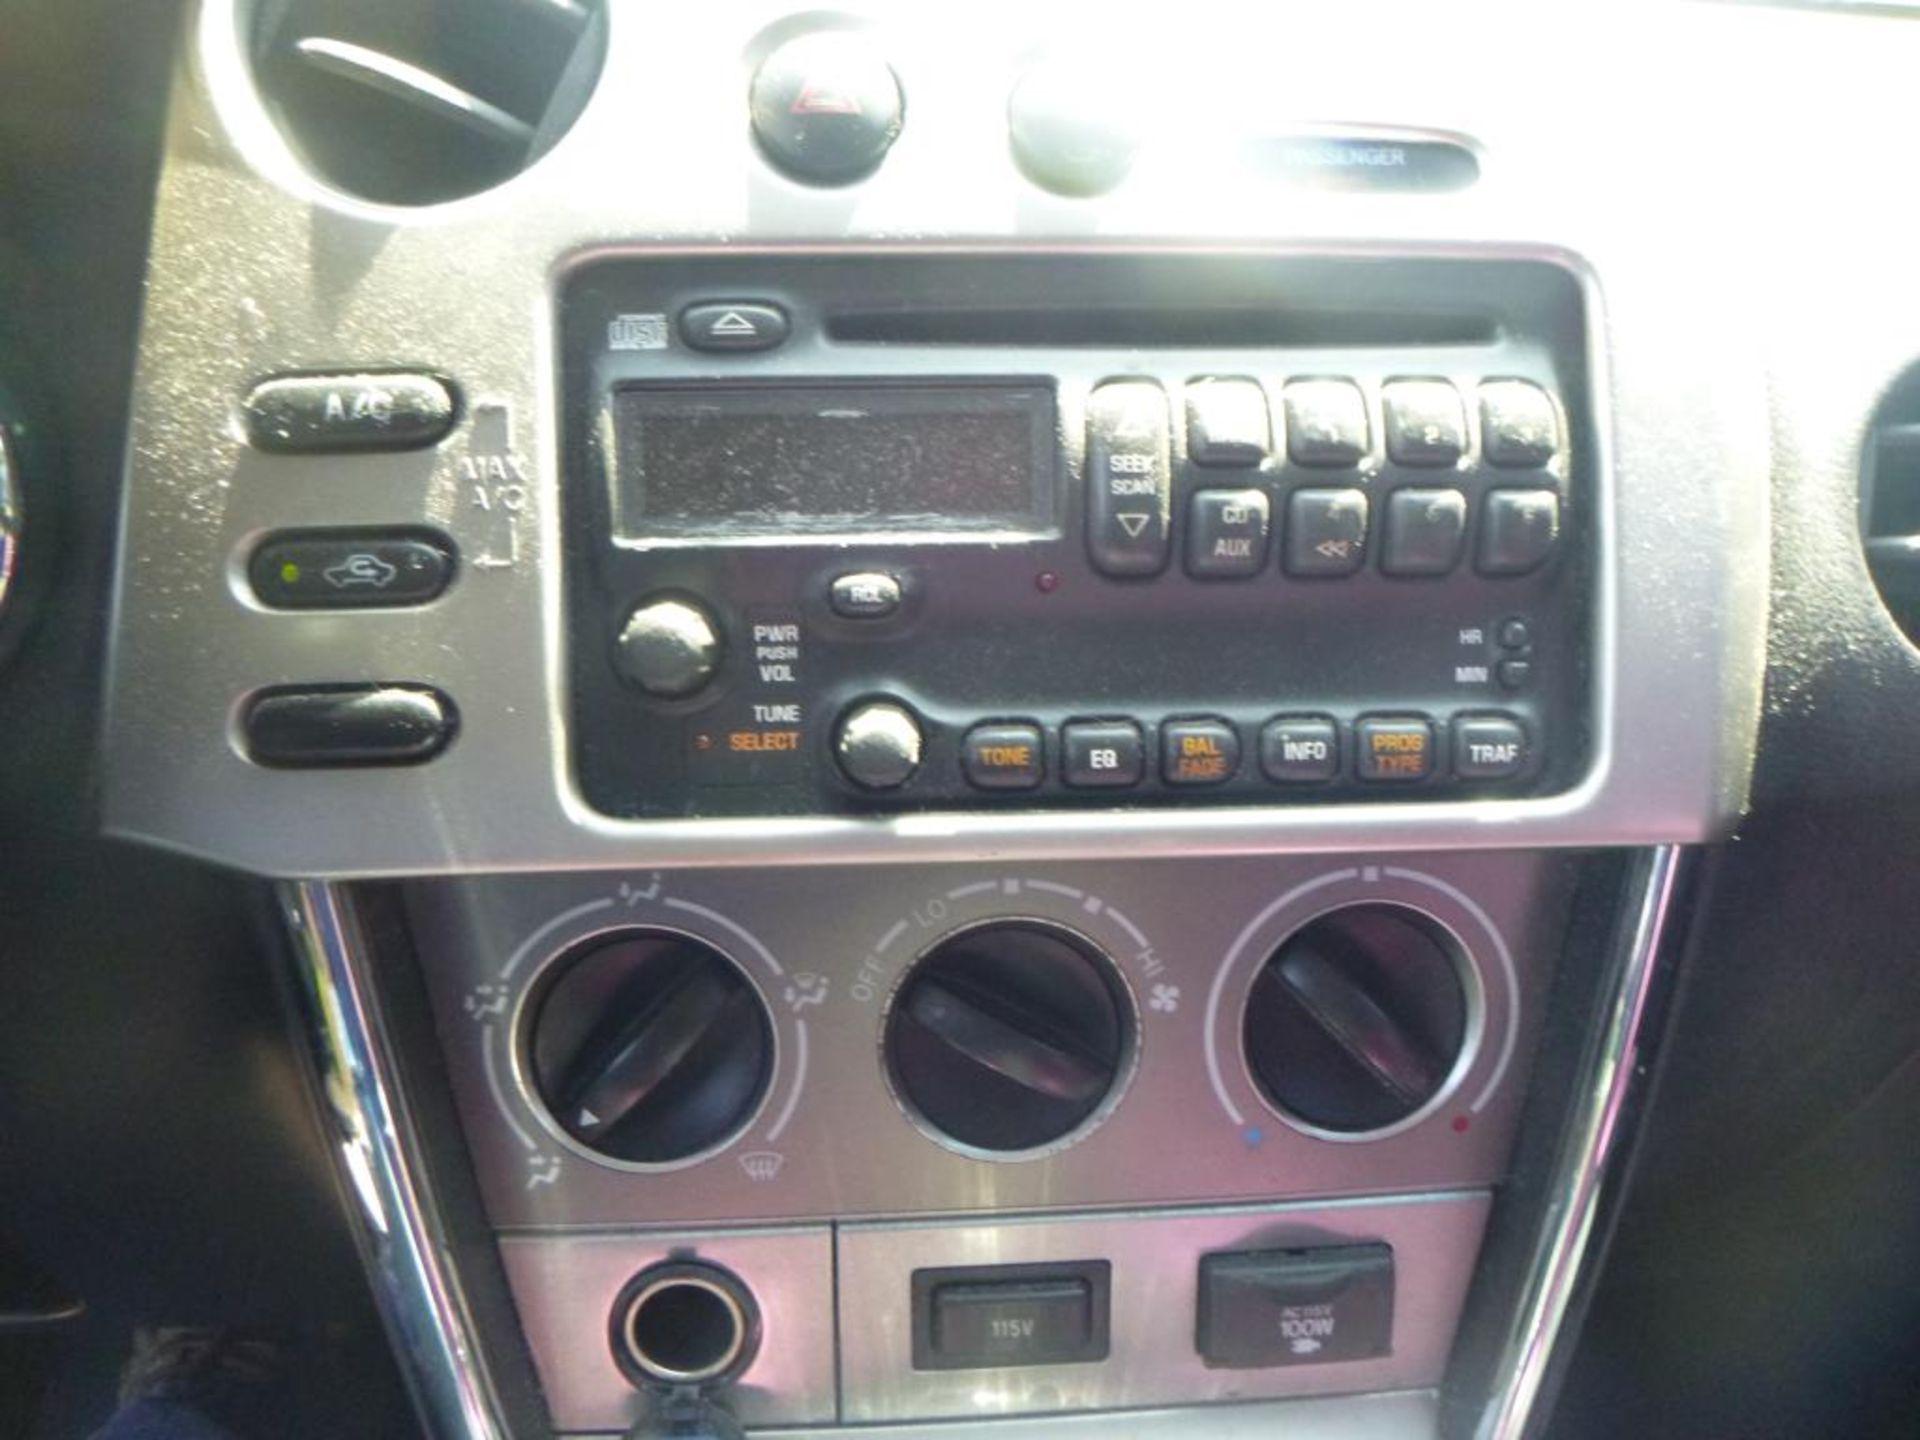 2006 Pontiac Vibe - Image 14 of 14